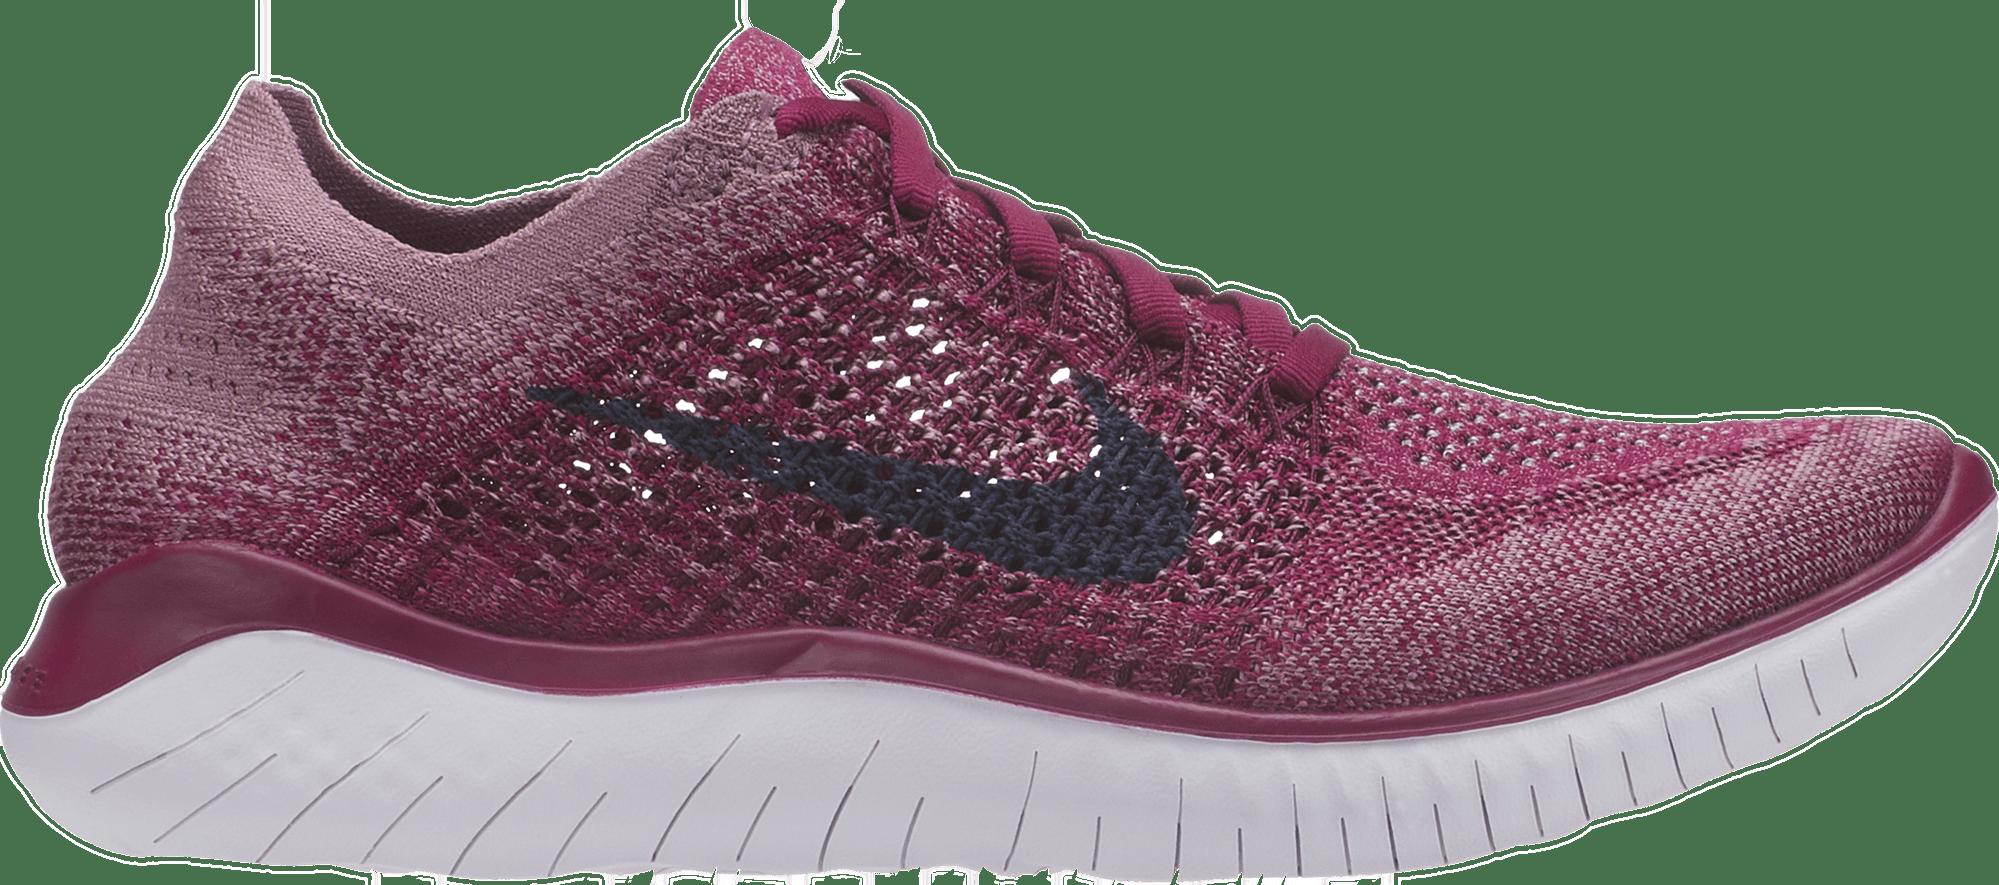 Free Run Flyknit Nike Laufschuh Natural Running Damenmodell